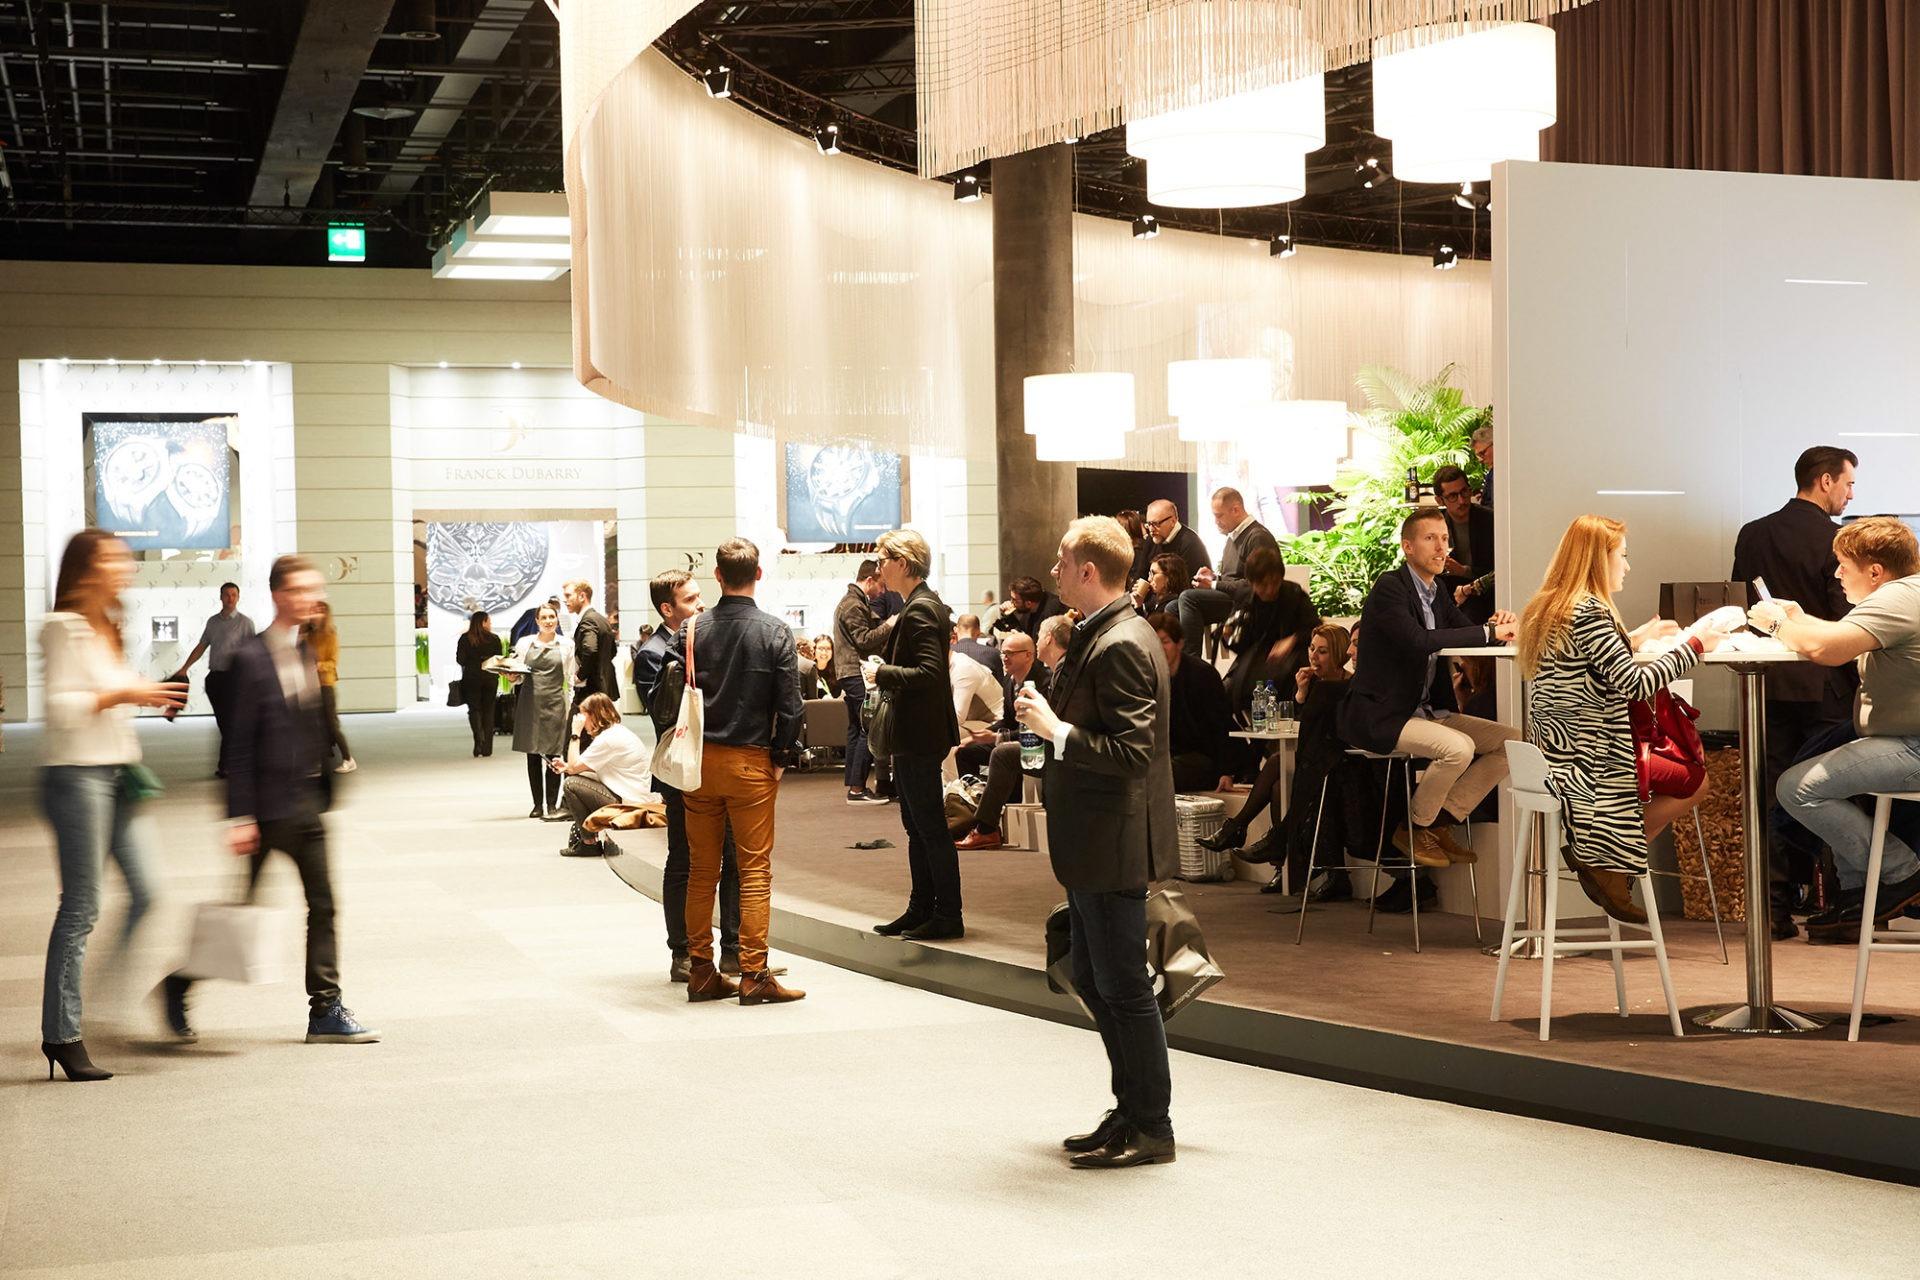 Baselworld 2019 - Restaurants - Crédits Volker Renner